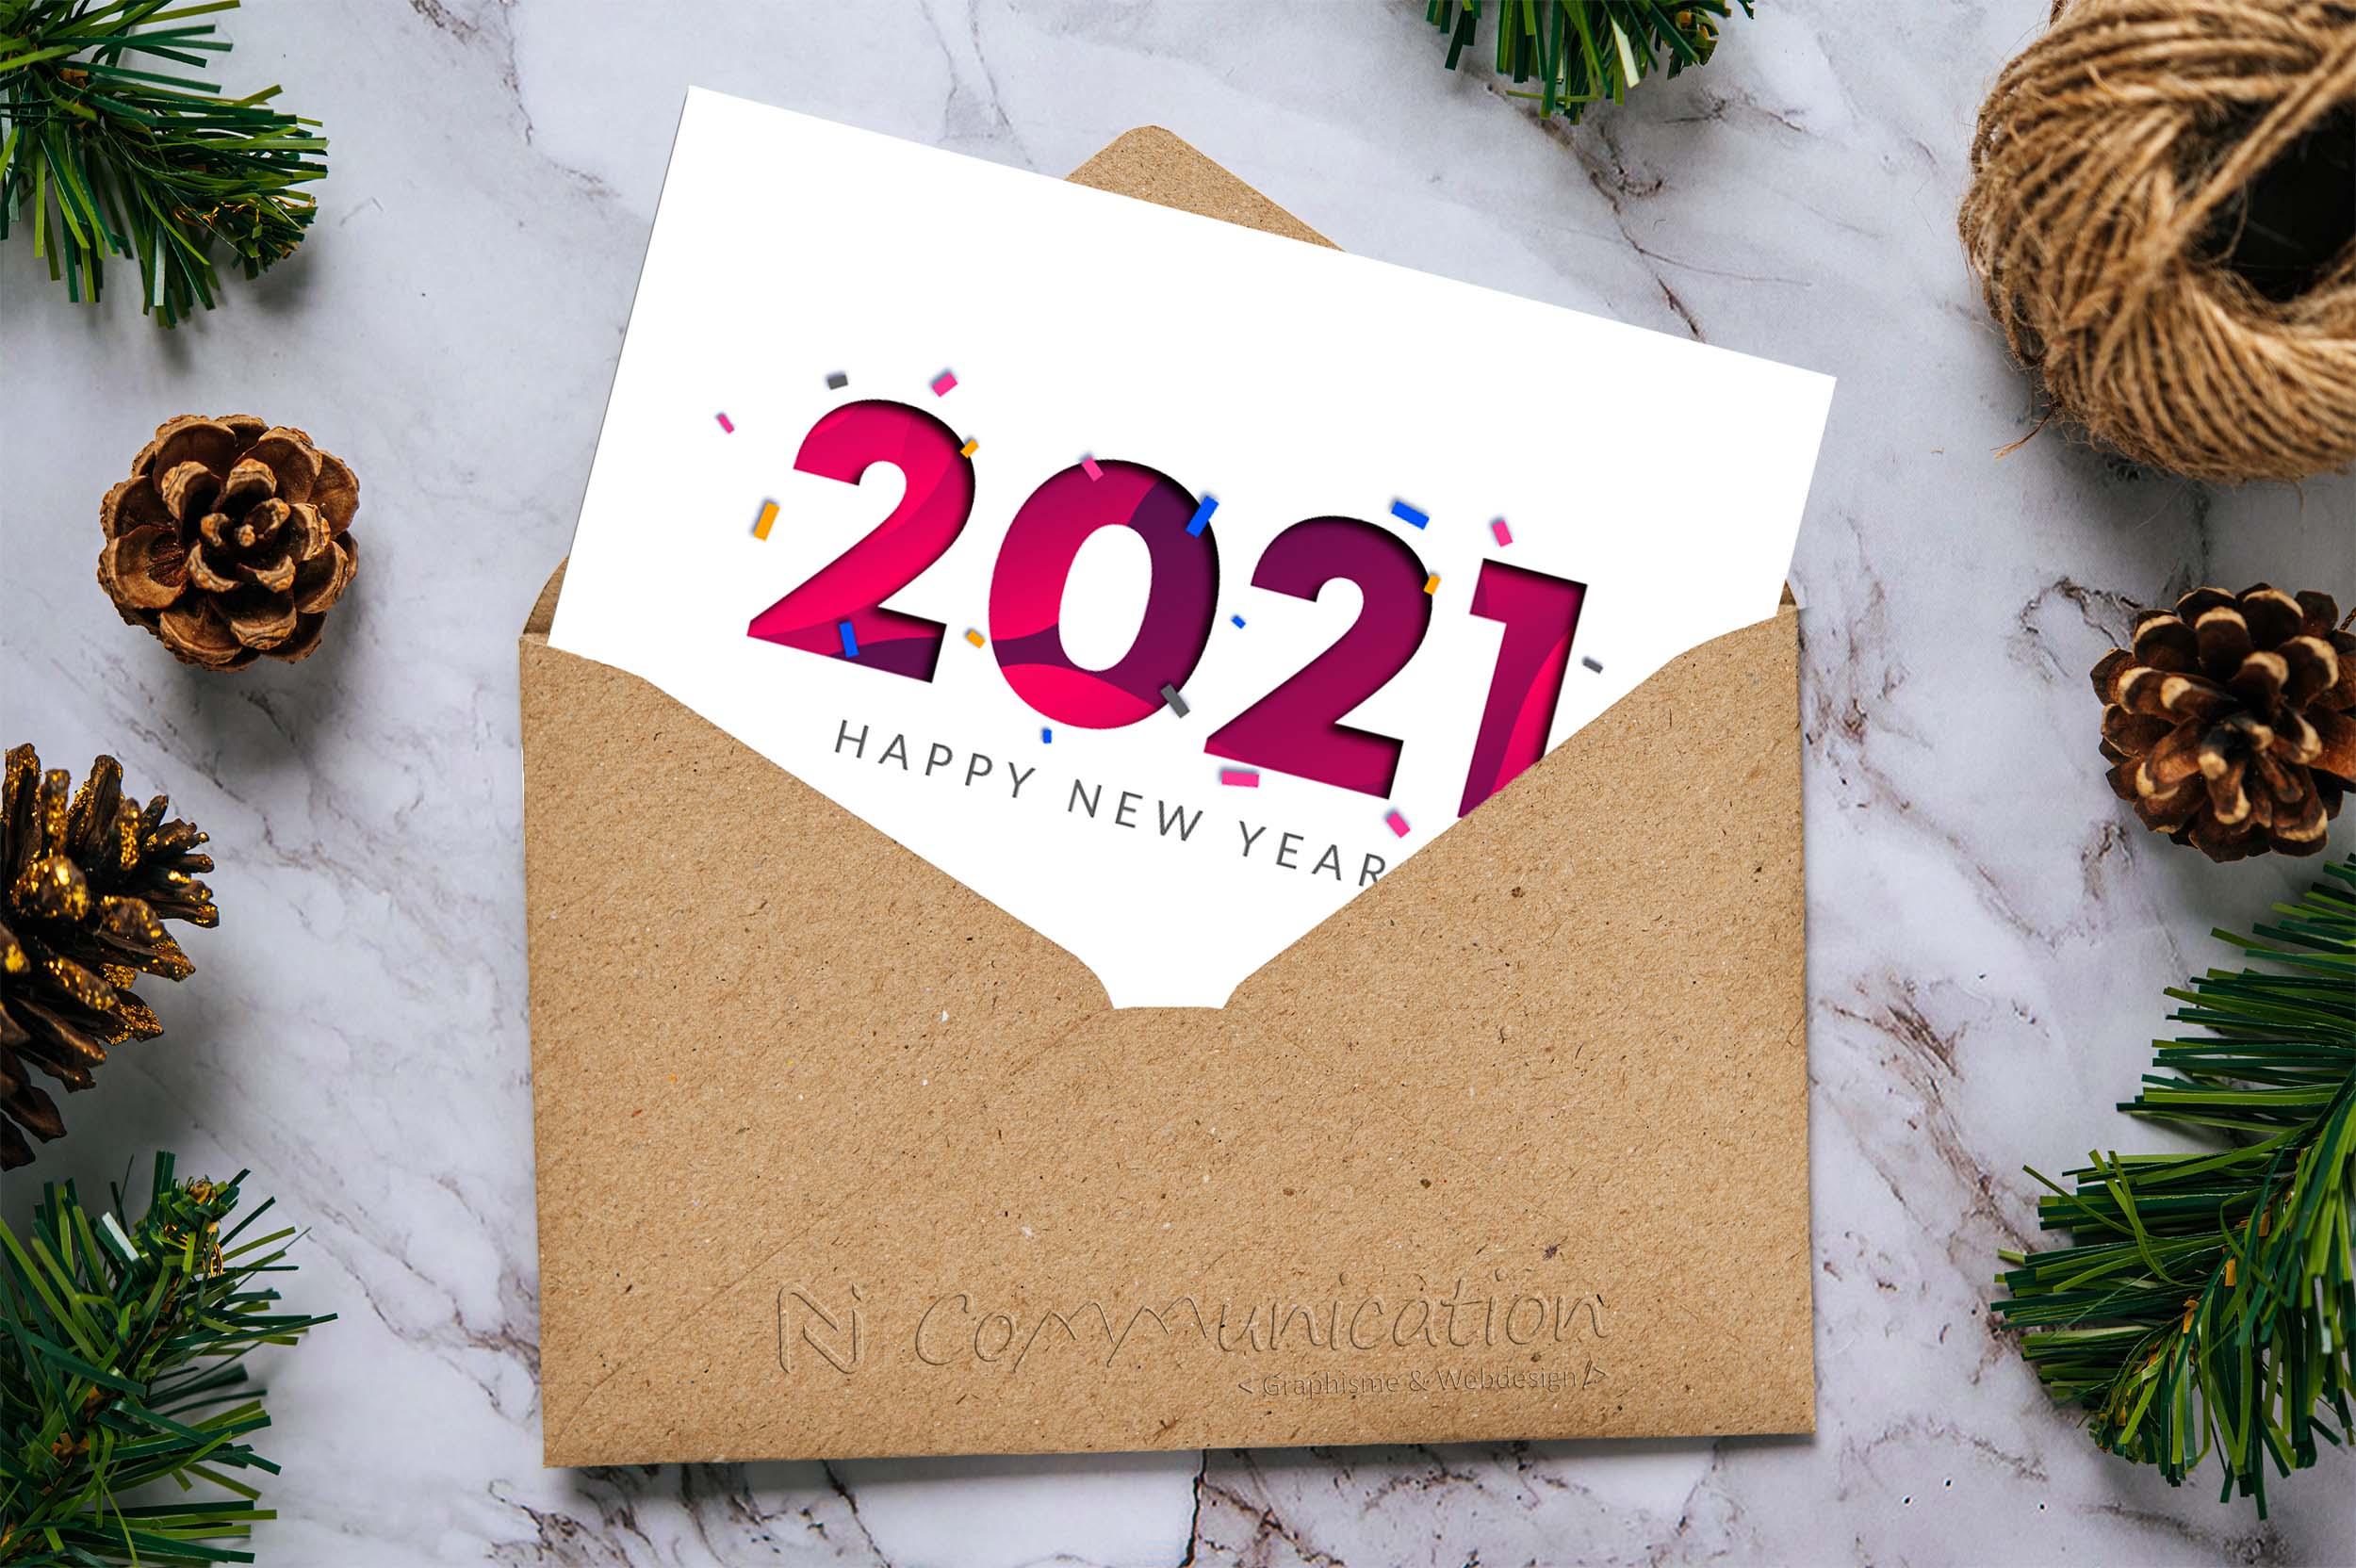 nj communication 2021